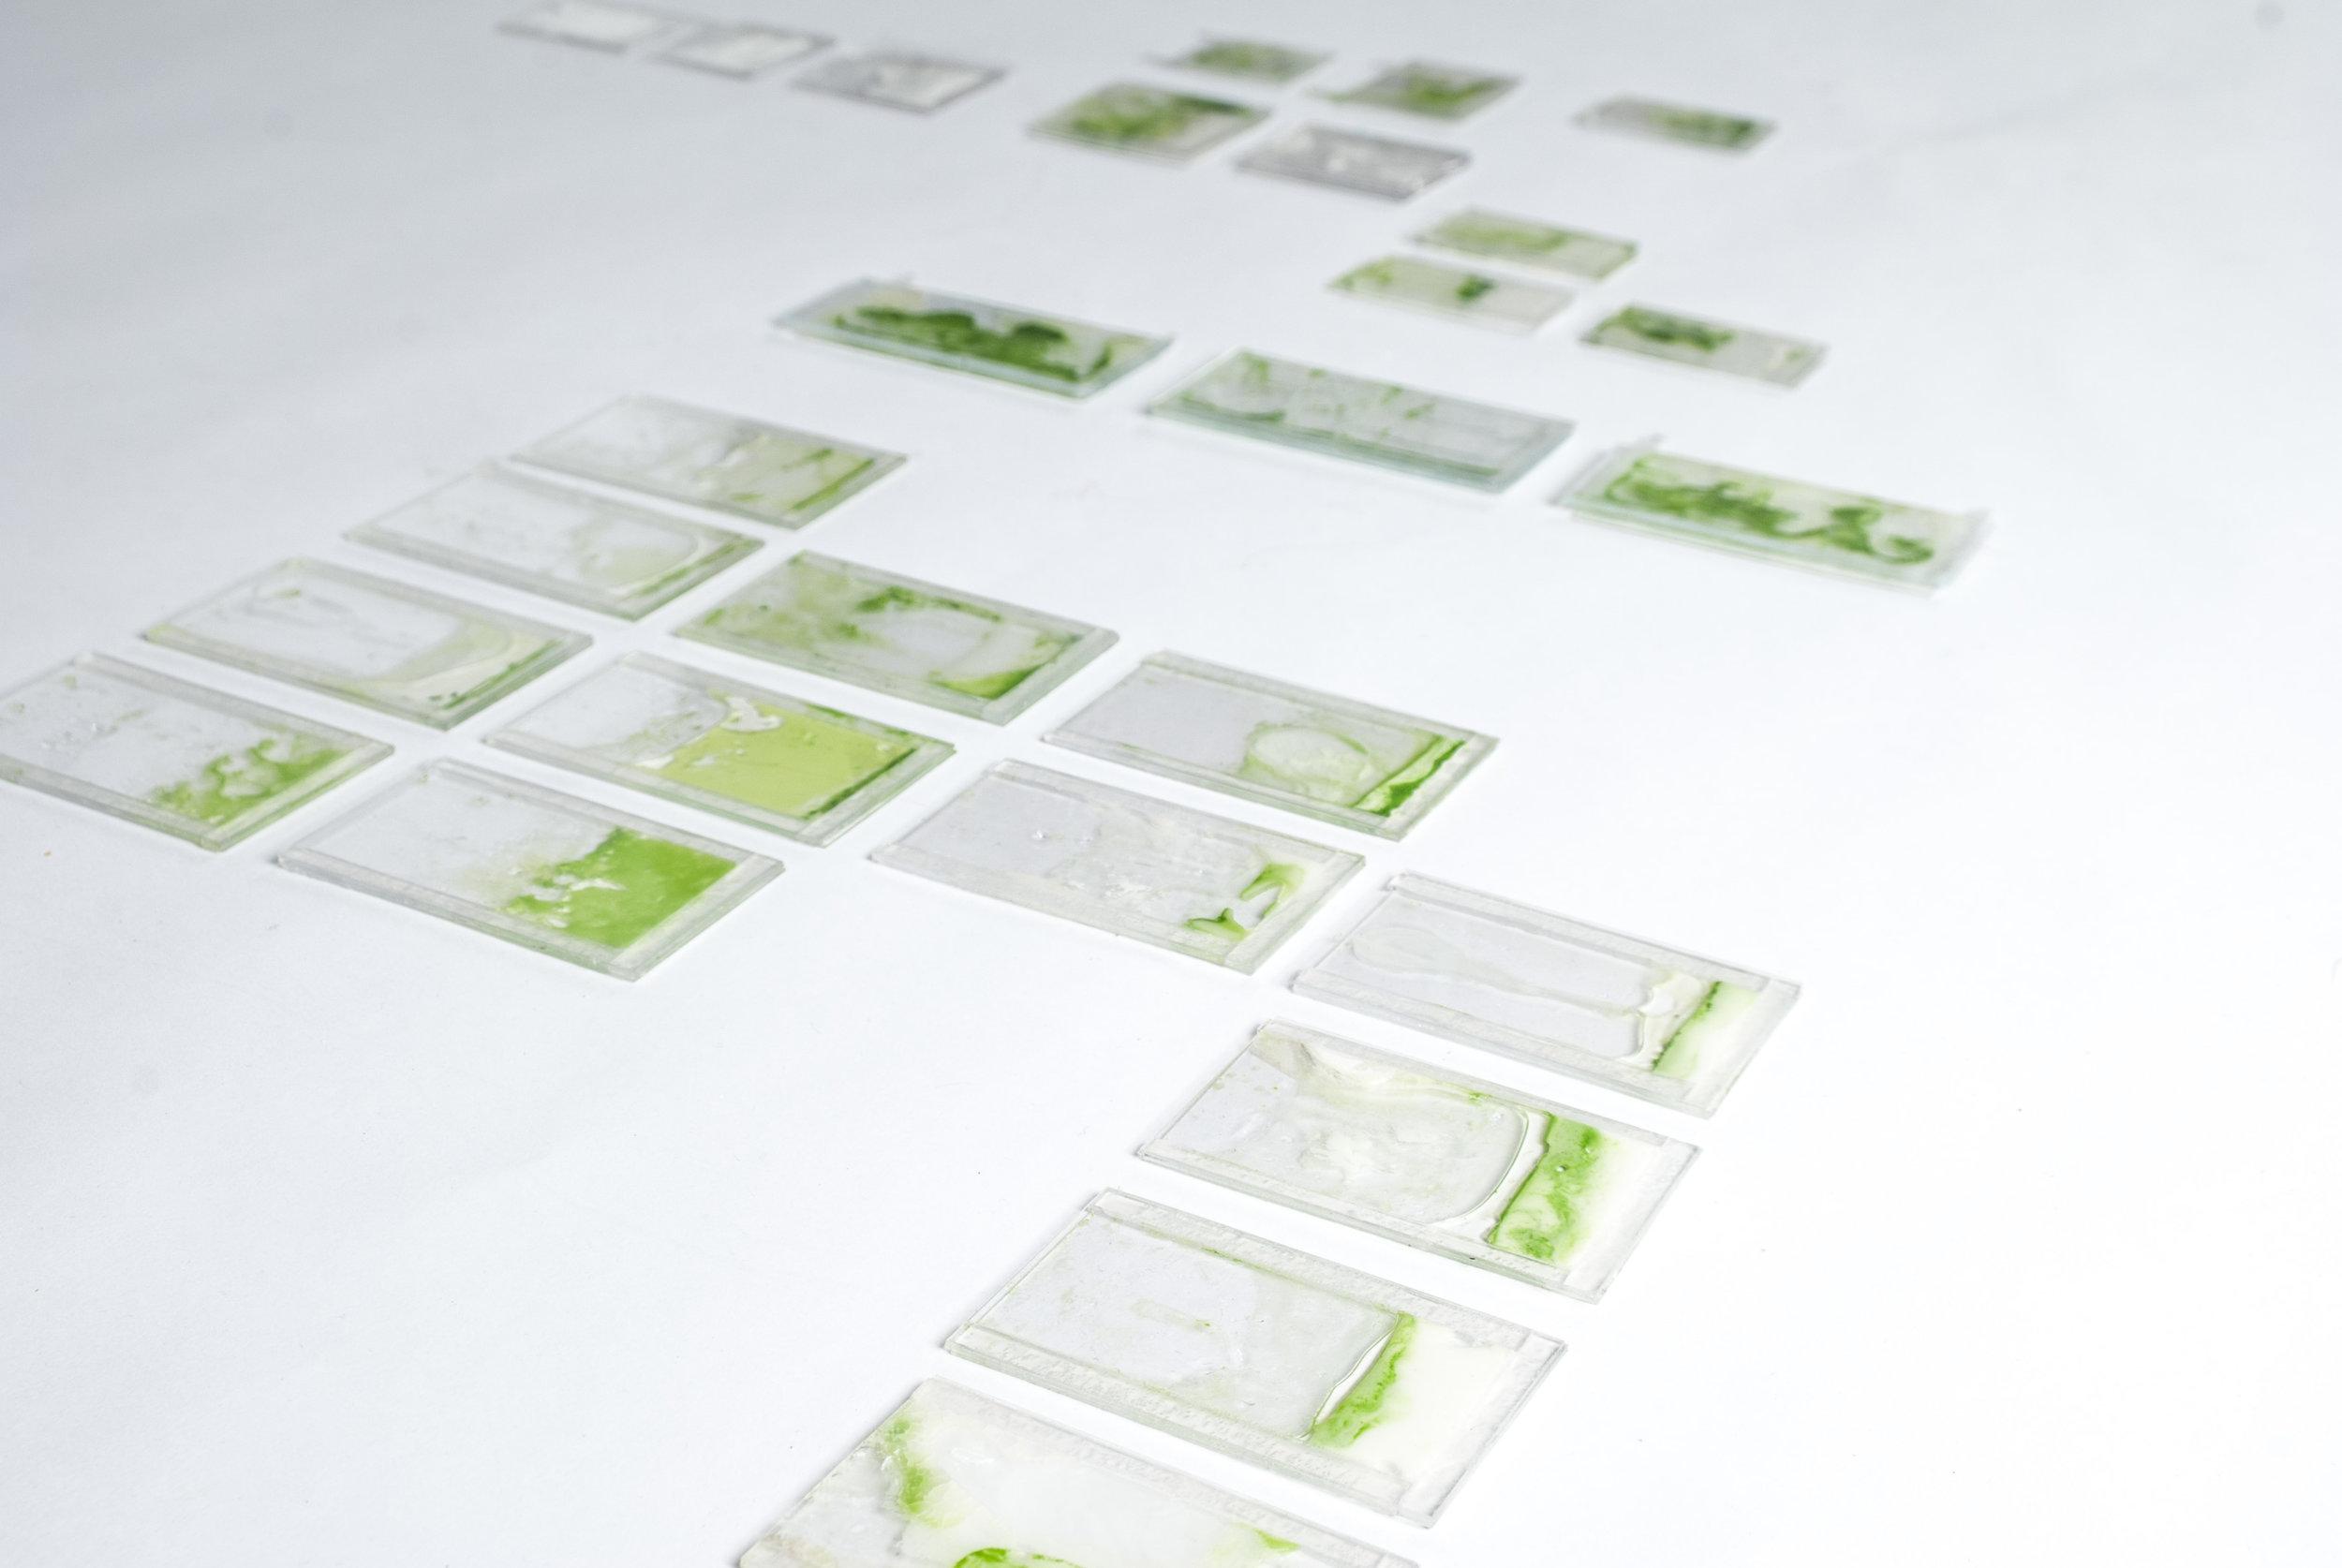 Phase 1 - Materialität - Intuitives Spiel   Autor: Paul Ludwig Woellner Photo: Johanna Schneider, Yannik Kaiser, 2017